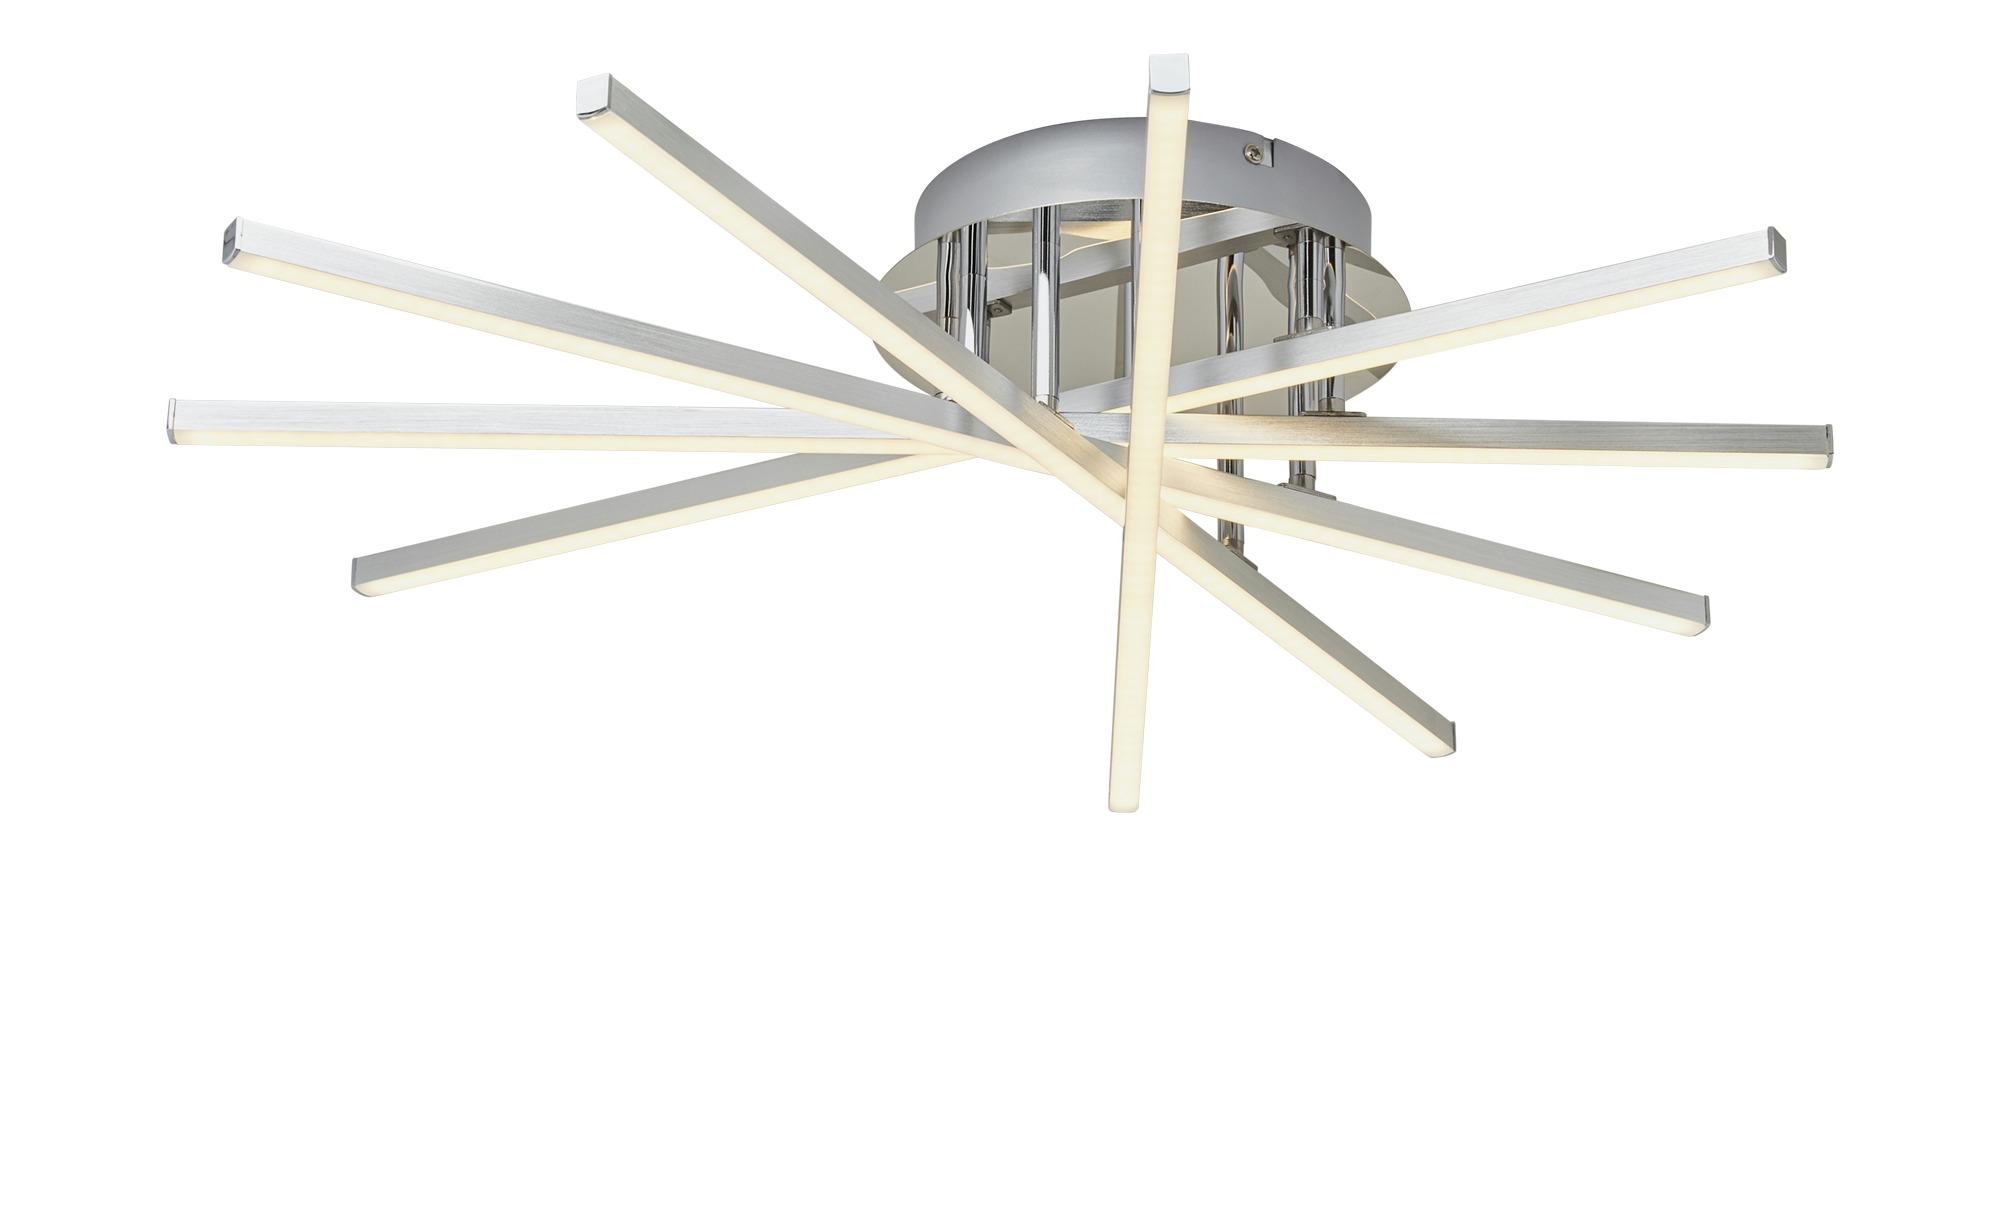 KHG LED-Deckenleuchte, 5-flammig ¦ silber ¦ Maße (cm): B: 61 H: 13,5 Lampen & Leuchten > Innenleuchten > Deckenleuchten - Höffner